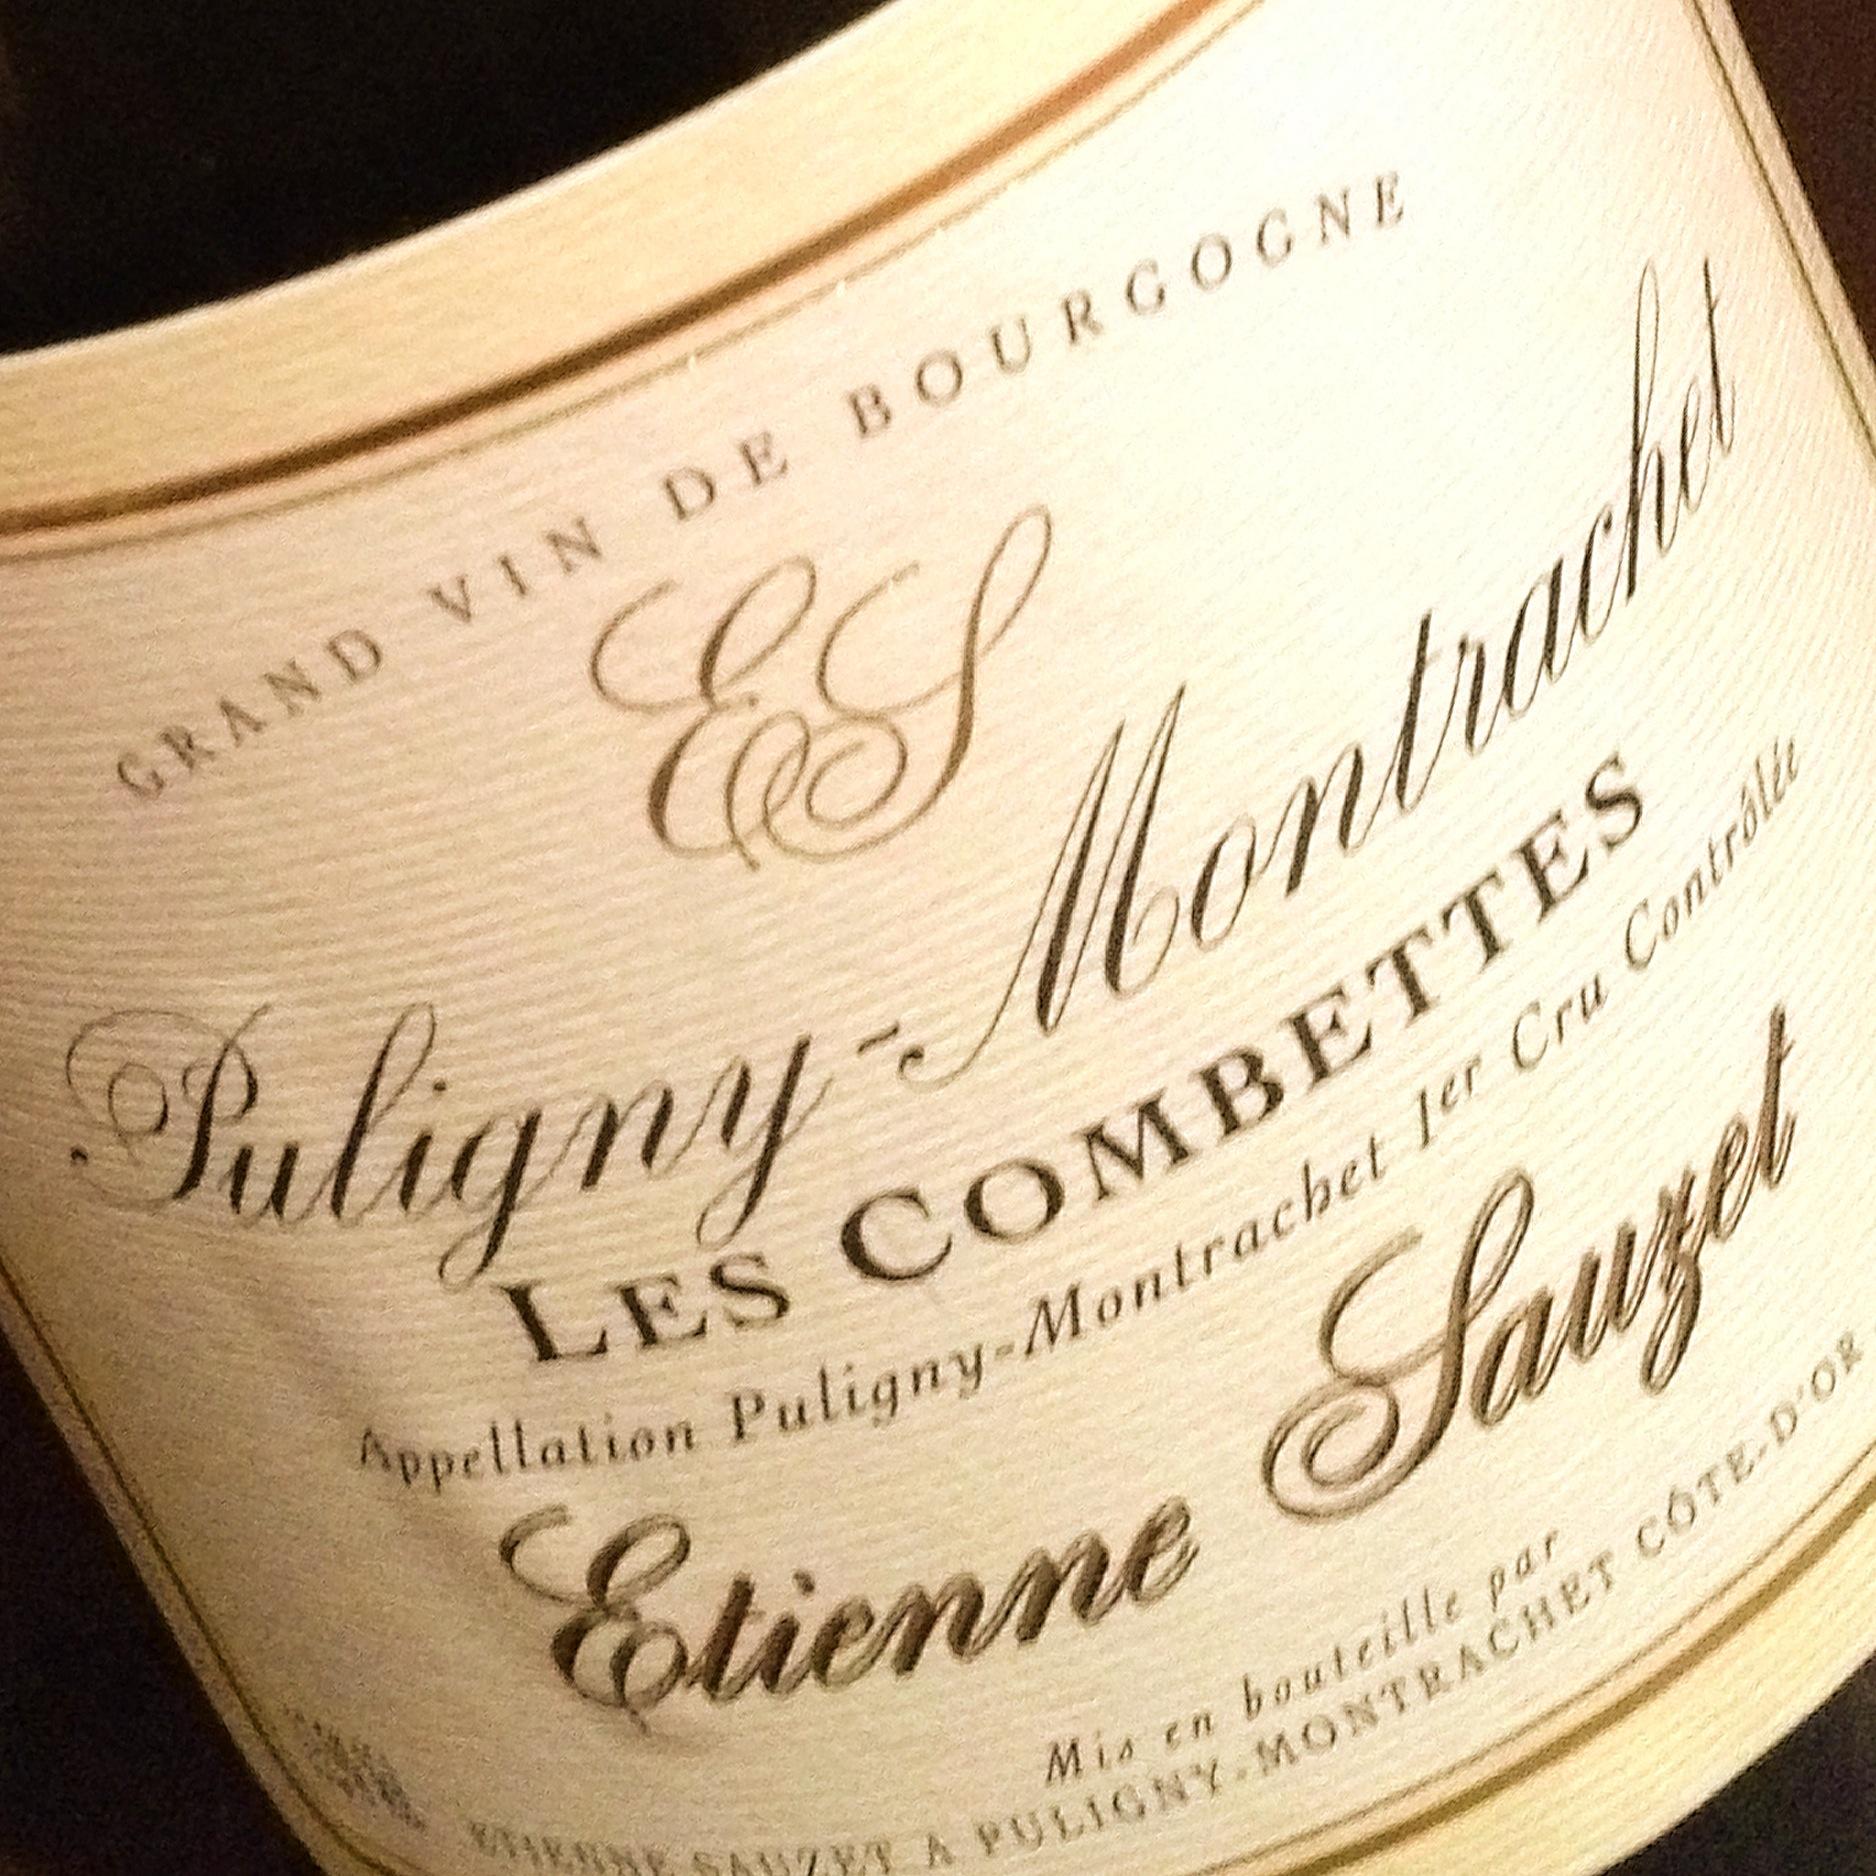 Great Wthie Burgundy 2005 copy.jpg